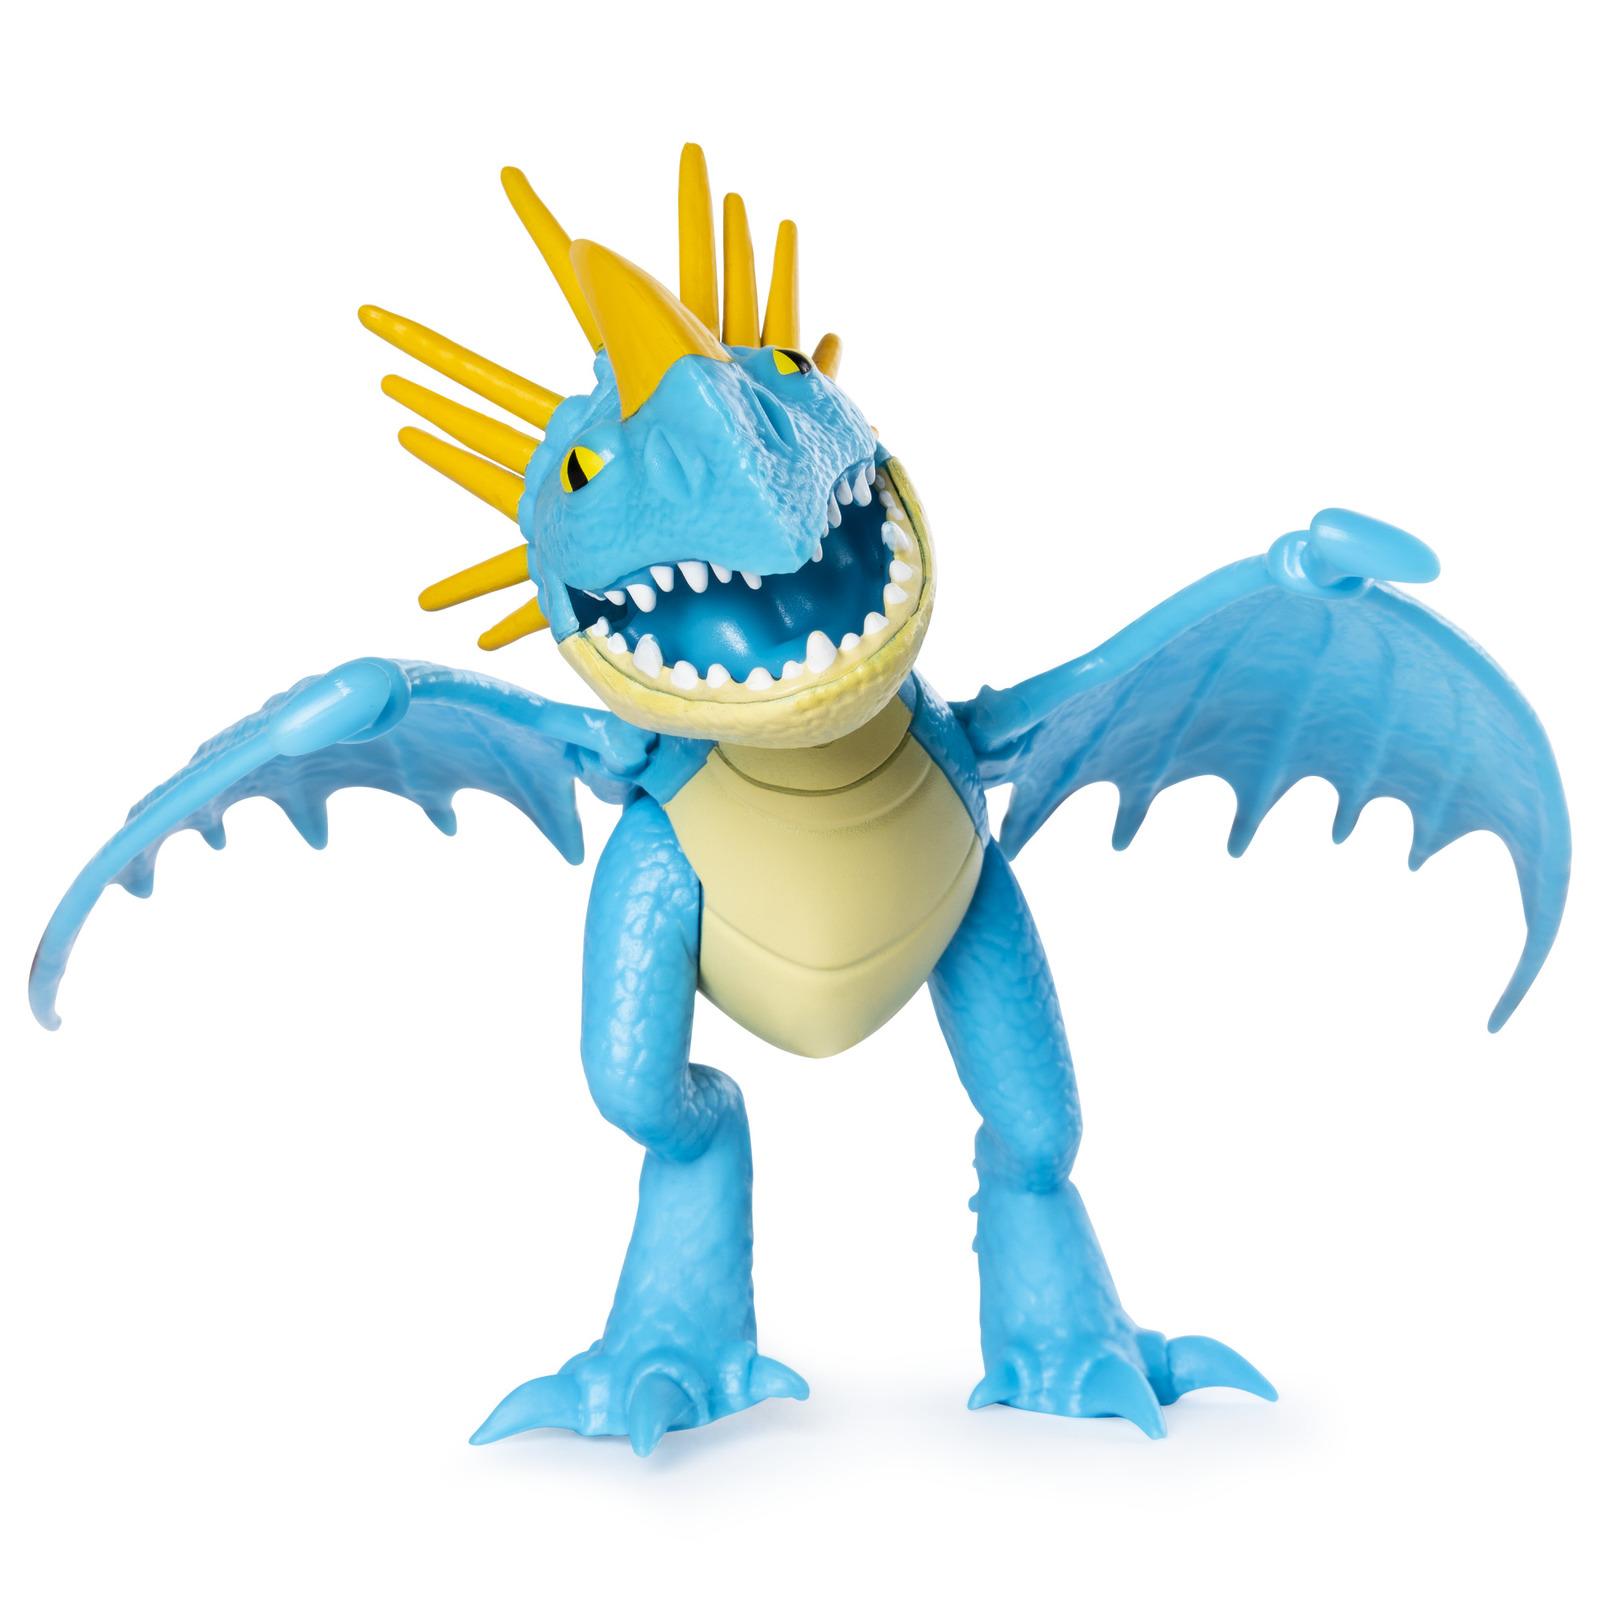 How to Train Your Dragon 3: Stormfly - Basic Dragon Figure image